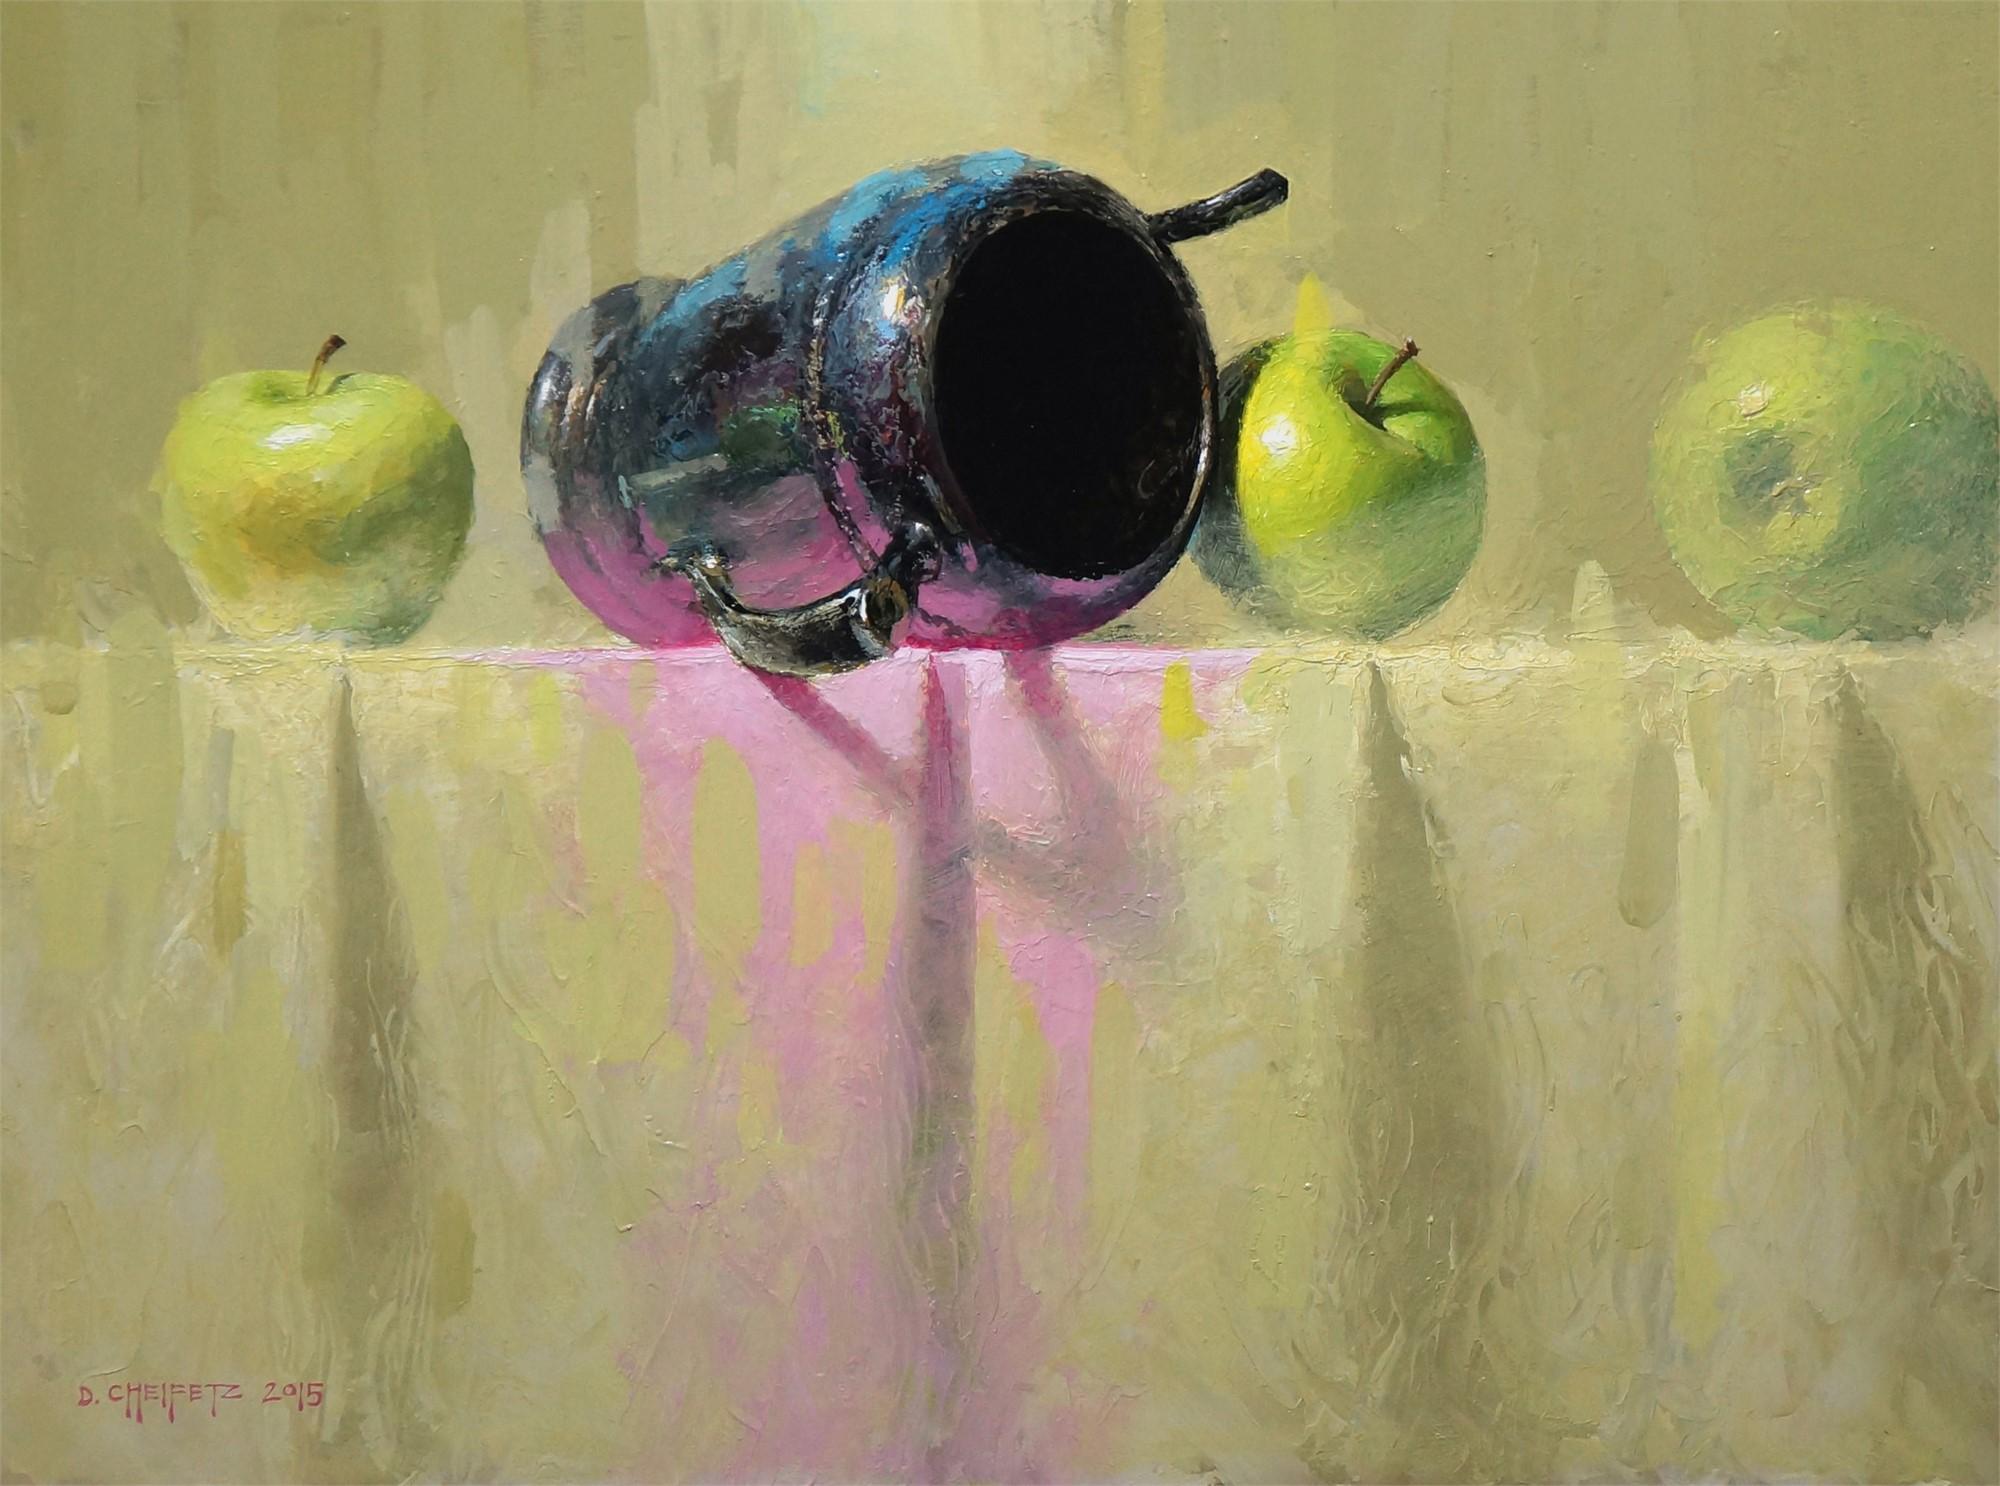 Black Hole by David Cheifetz